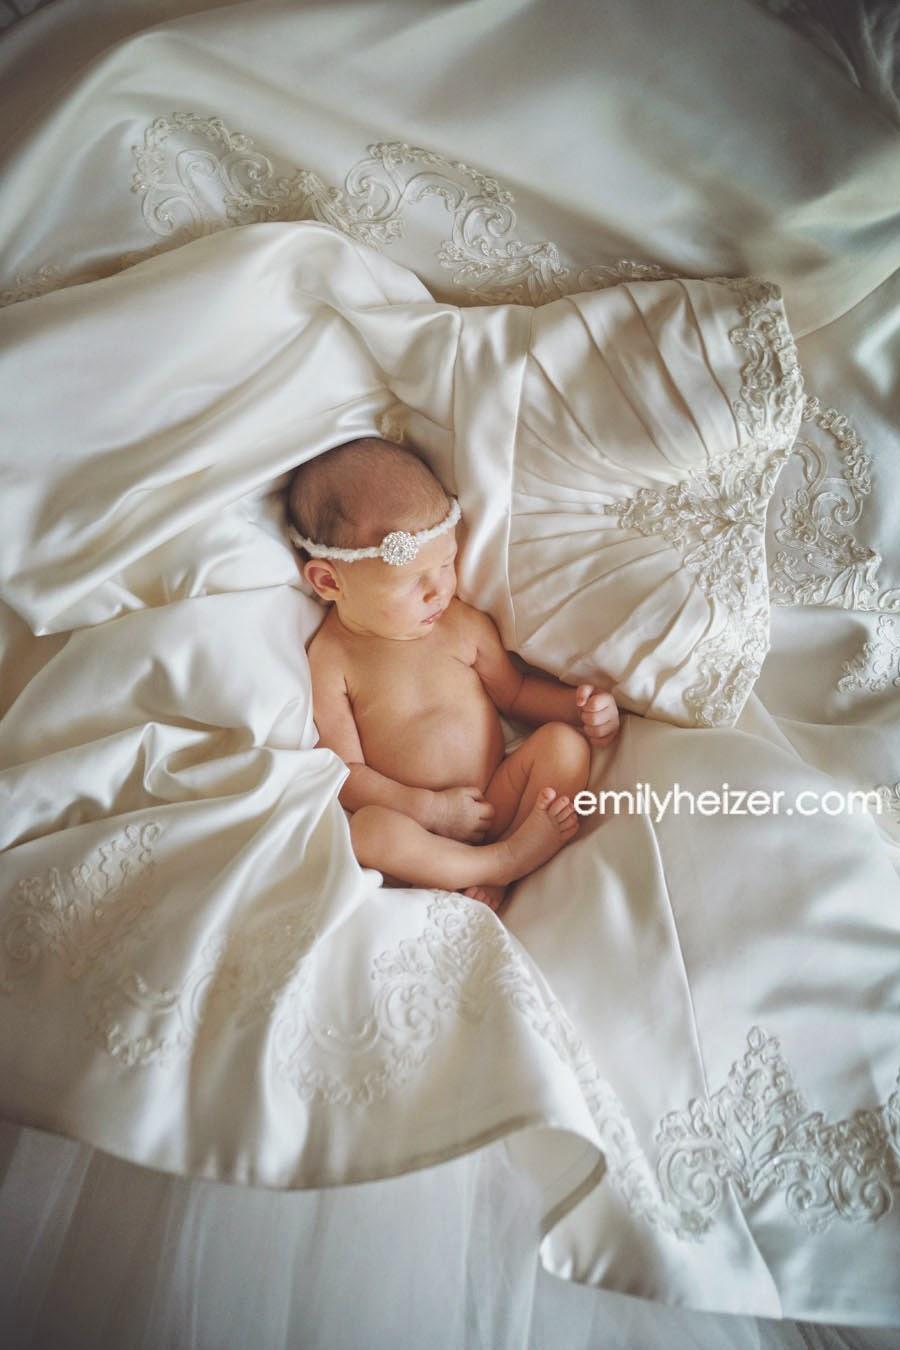 Newborn Wedding Dress 93 Nice Snoozin u on her